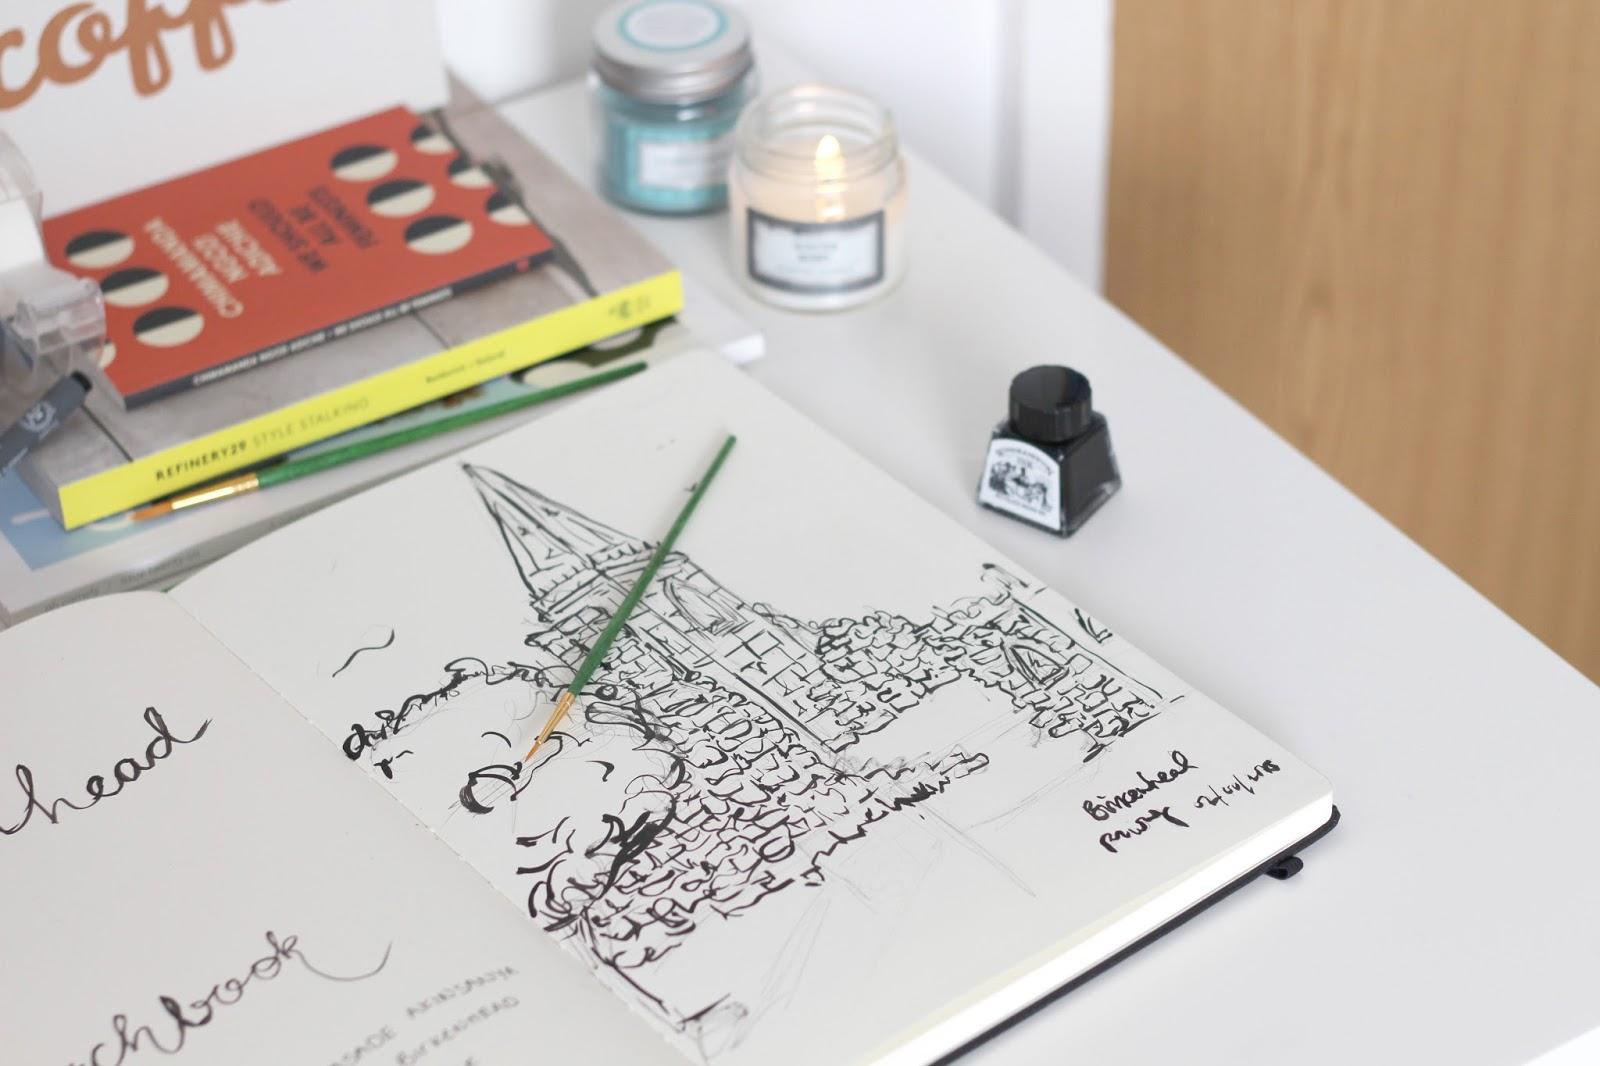 architecture student sketchbook moleskine